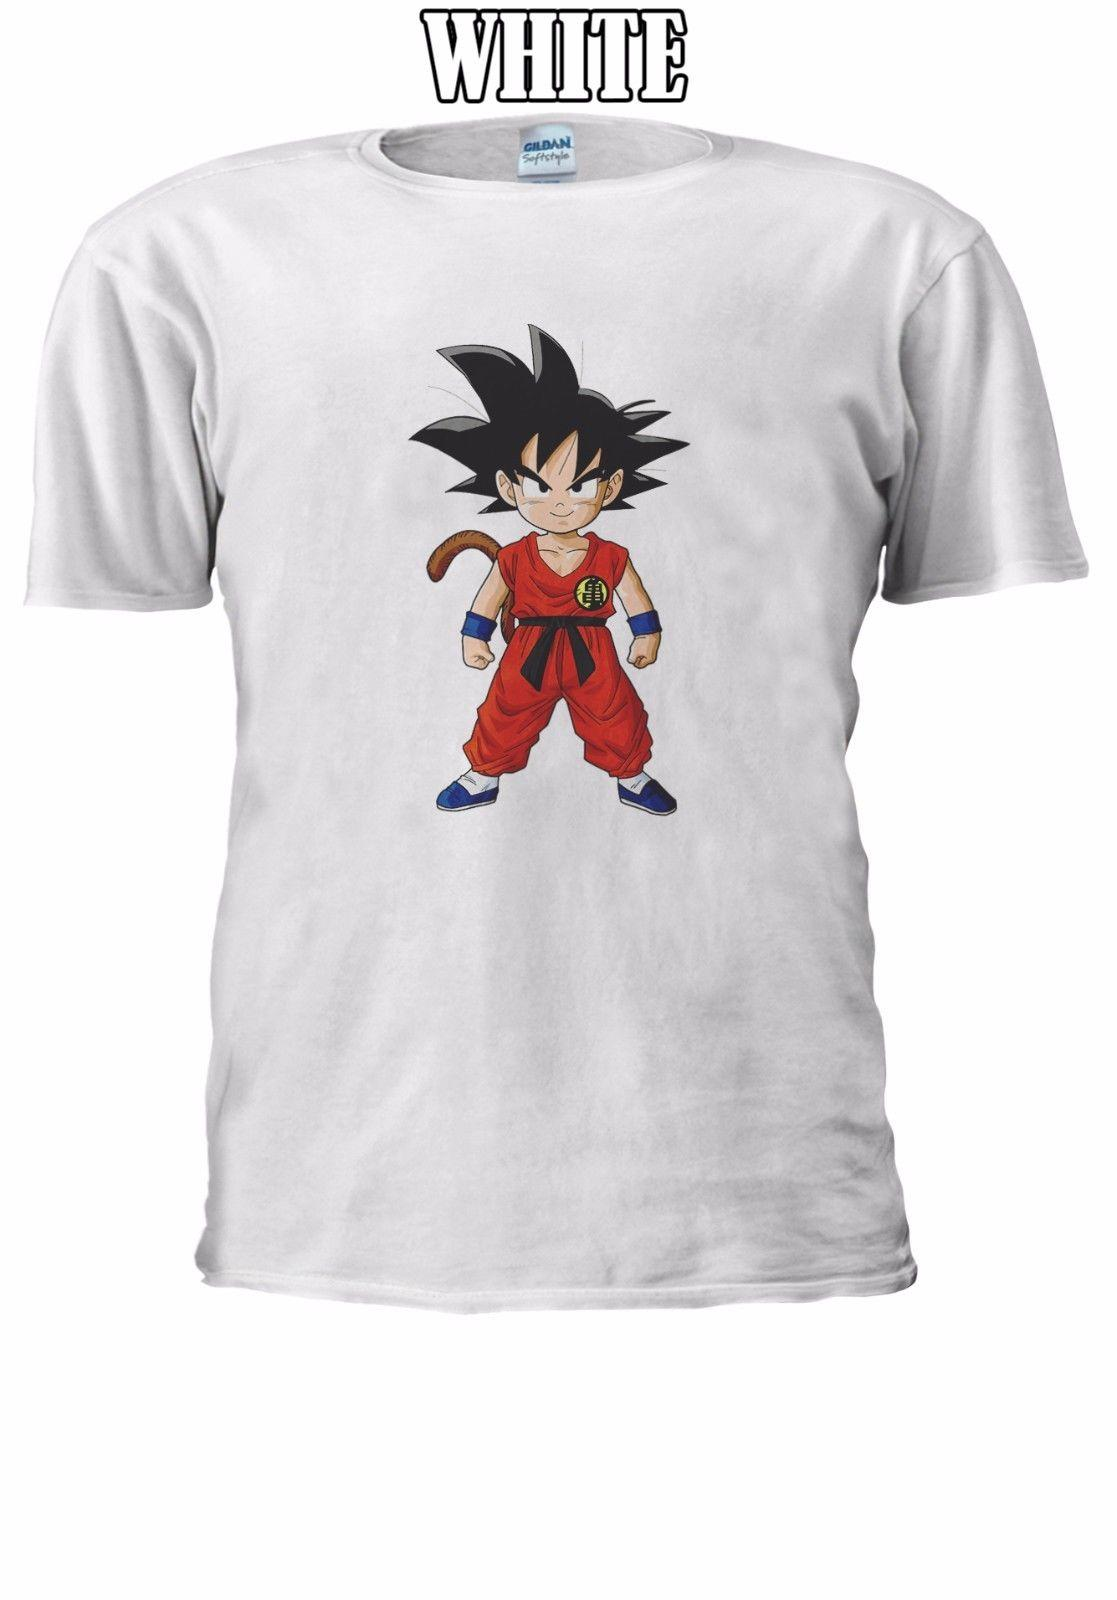 96d97959b3d Japanese Anime Manga Dragon Ball Goku Tshirt Vest Tank Top Men Women Unisex  2609 T Shirts Online Shopping Buy T Shirts From Beidhgate05, $11.01|  DHgate.Com